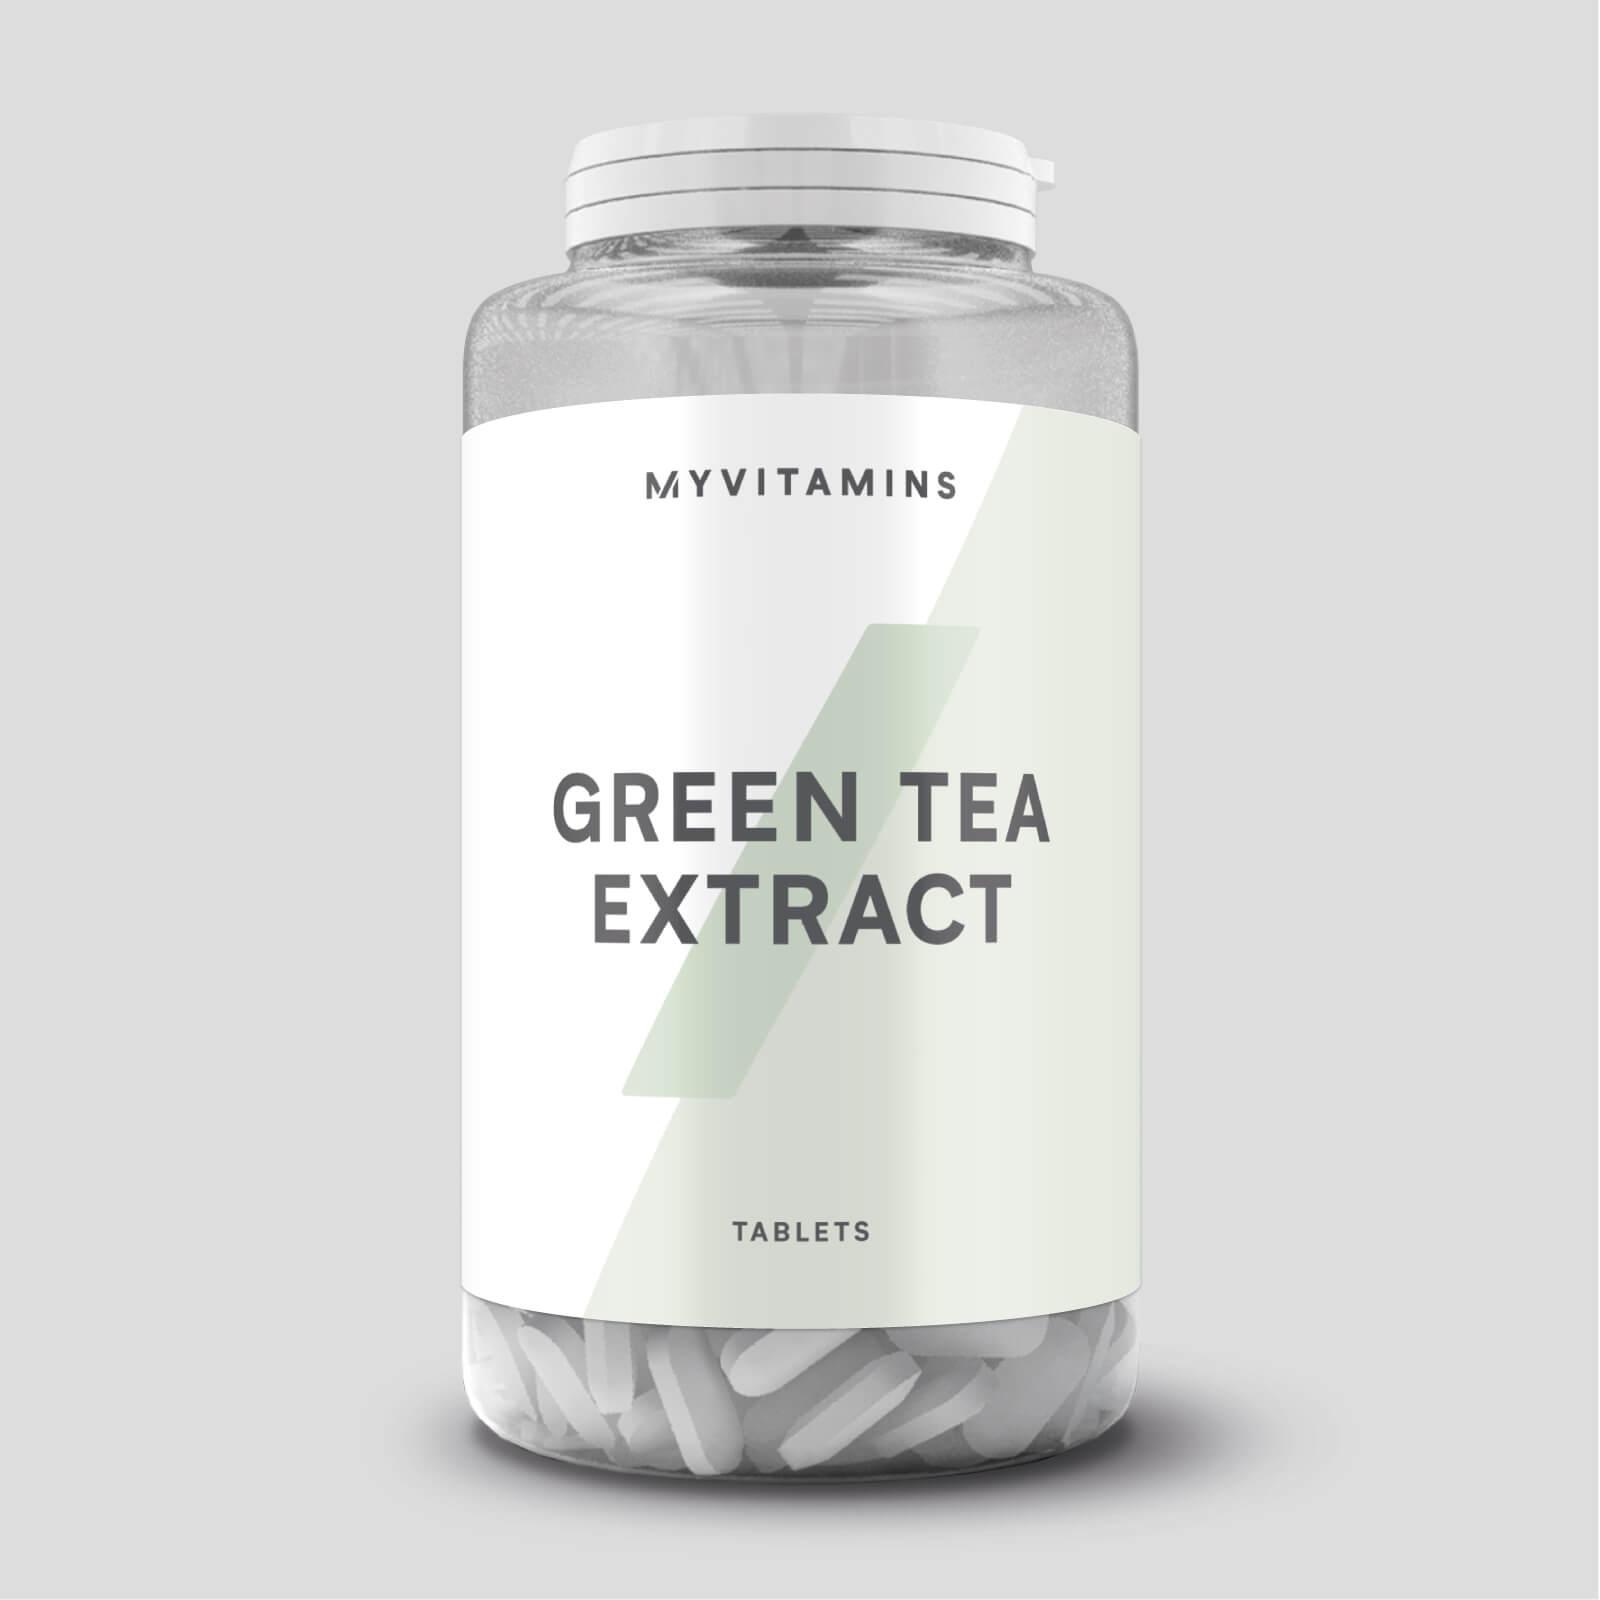 Myprotein Extrait de Thé Vert en comprimés - 120Comprimés